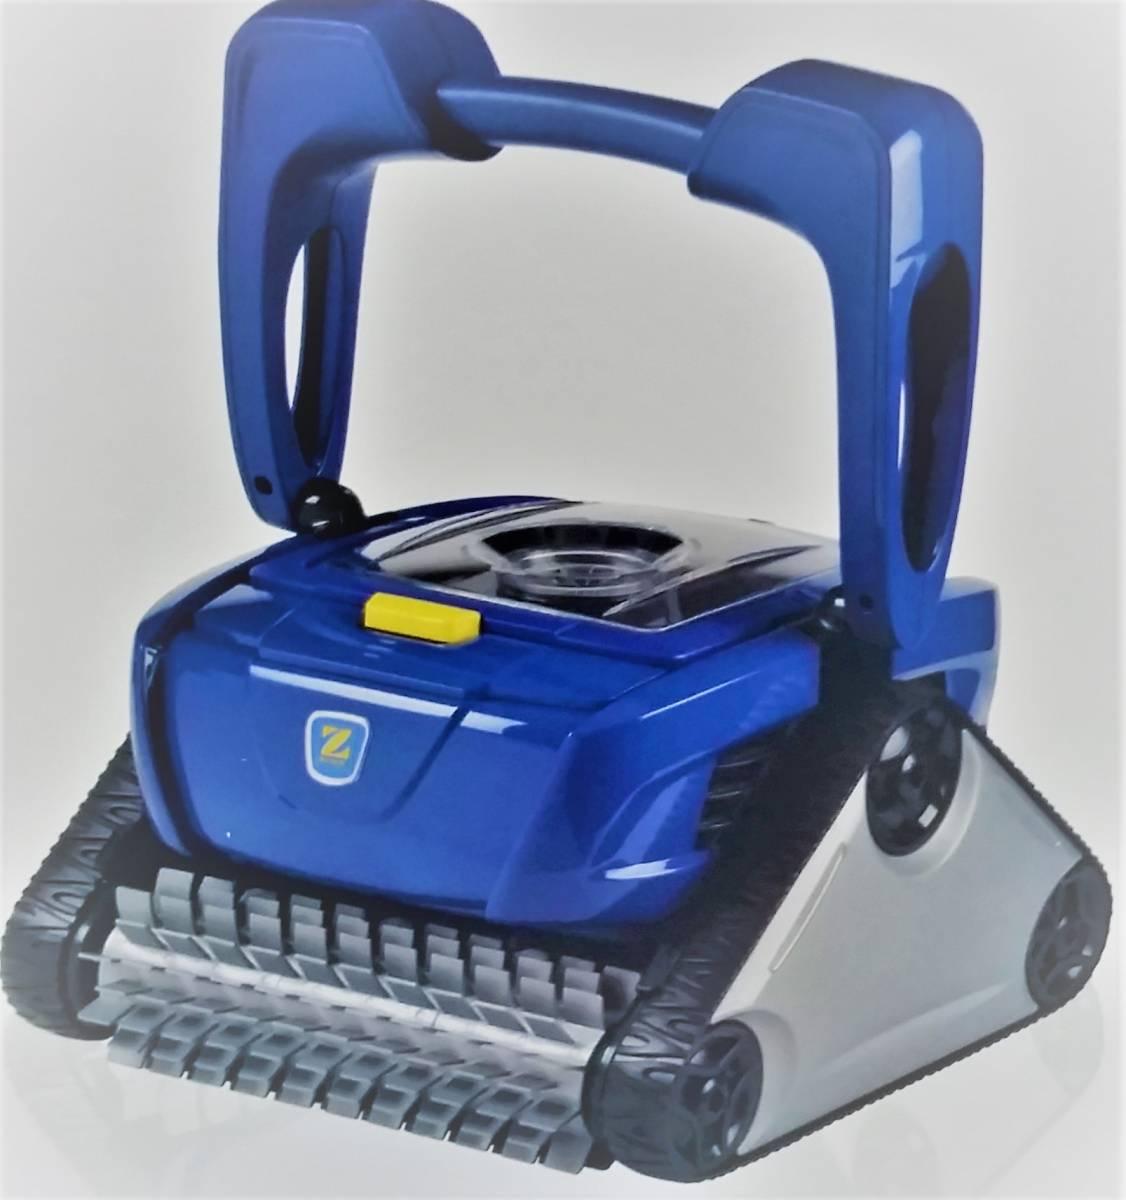 robot piscine rc4400 cyclonx pro